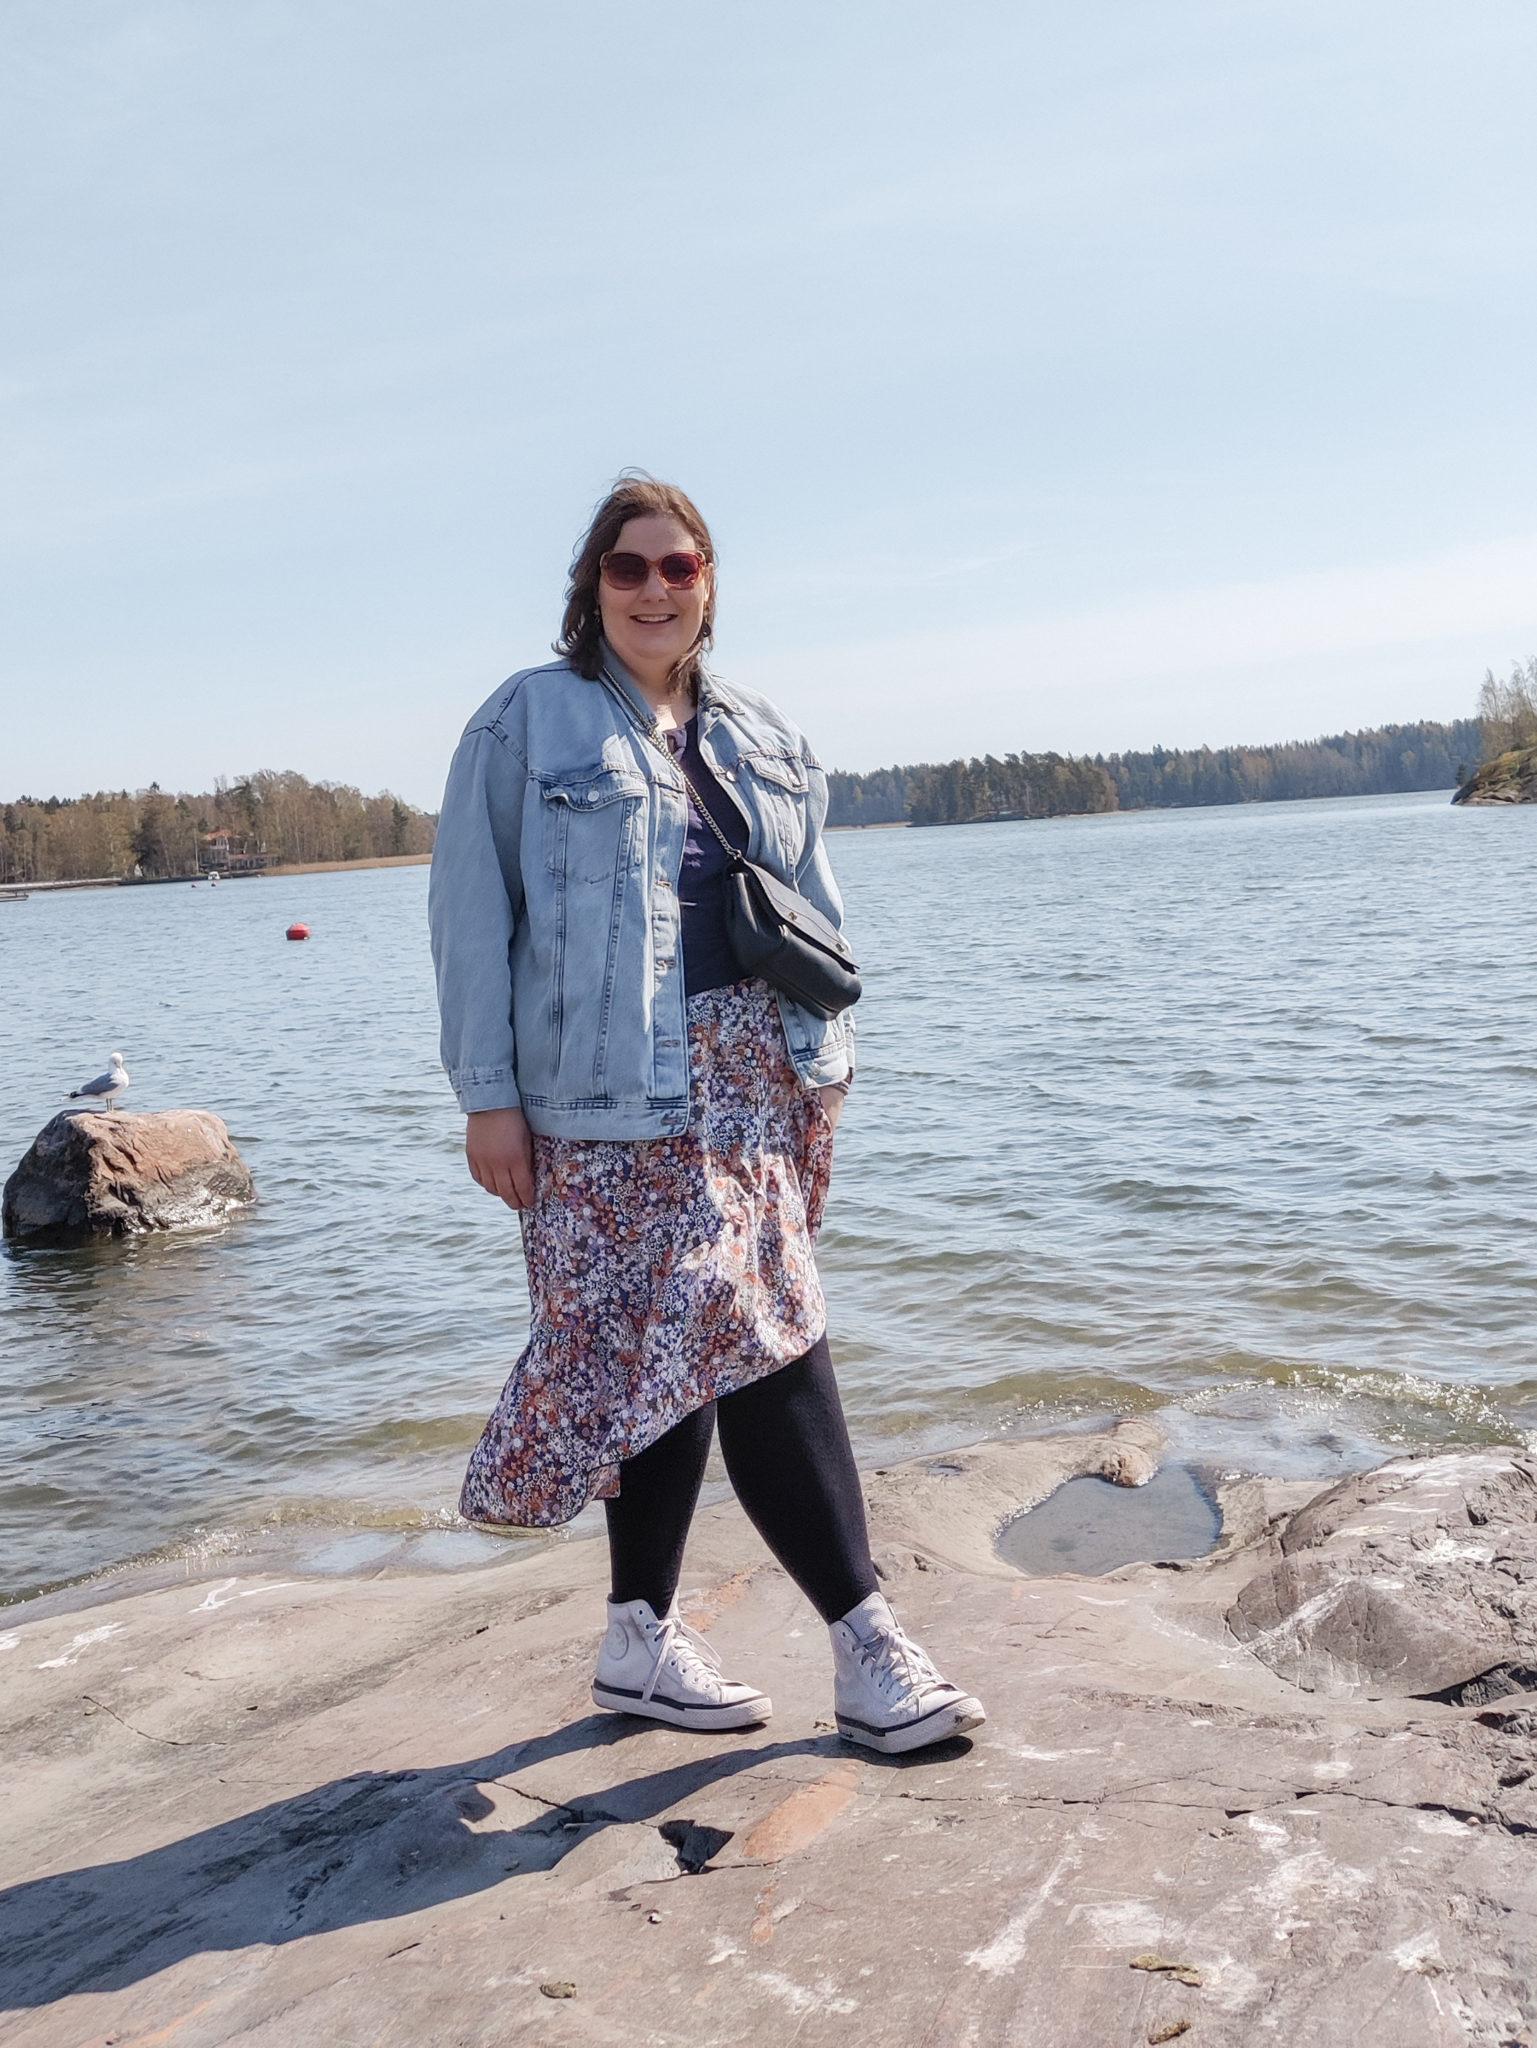 Milloin viimeksi blogihaaste - Big mamas home by Jenni